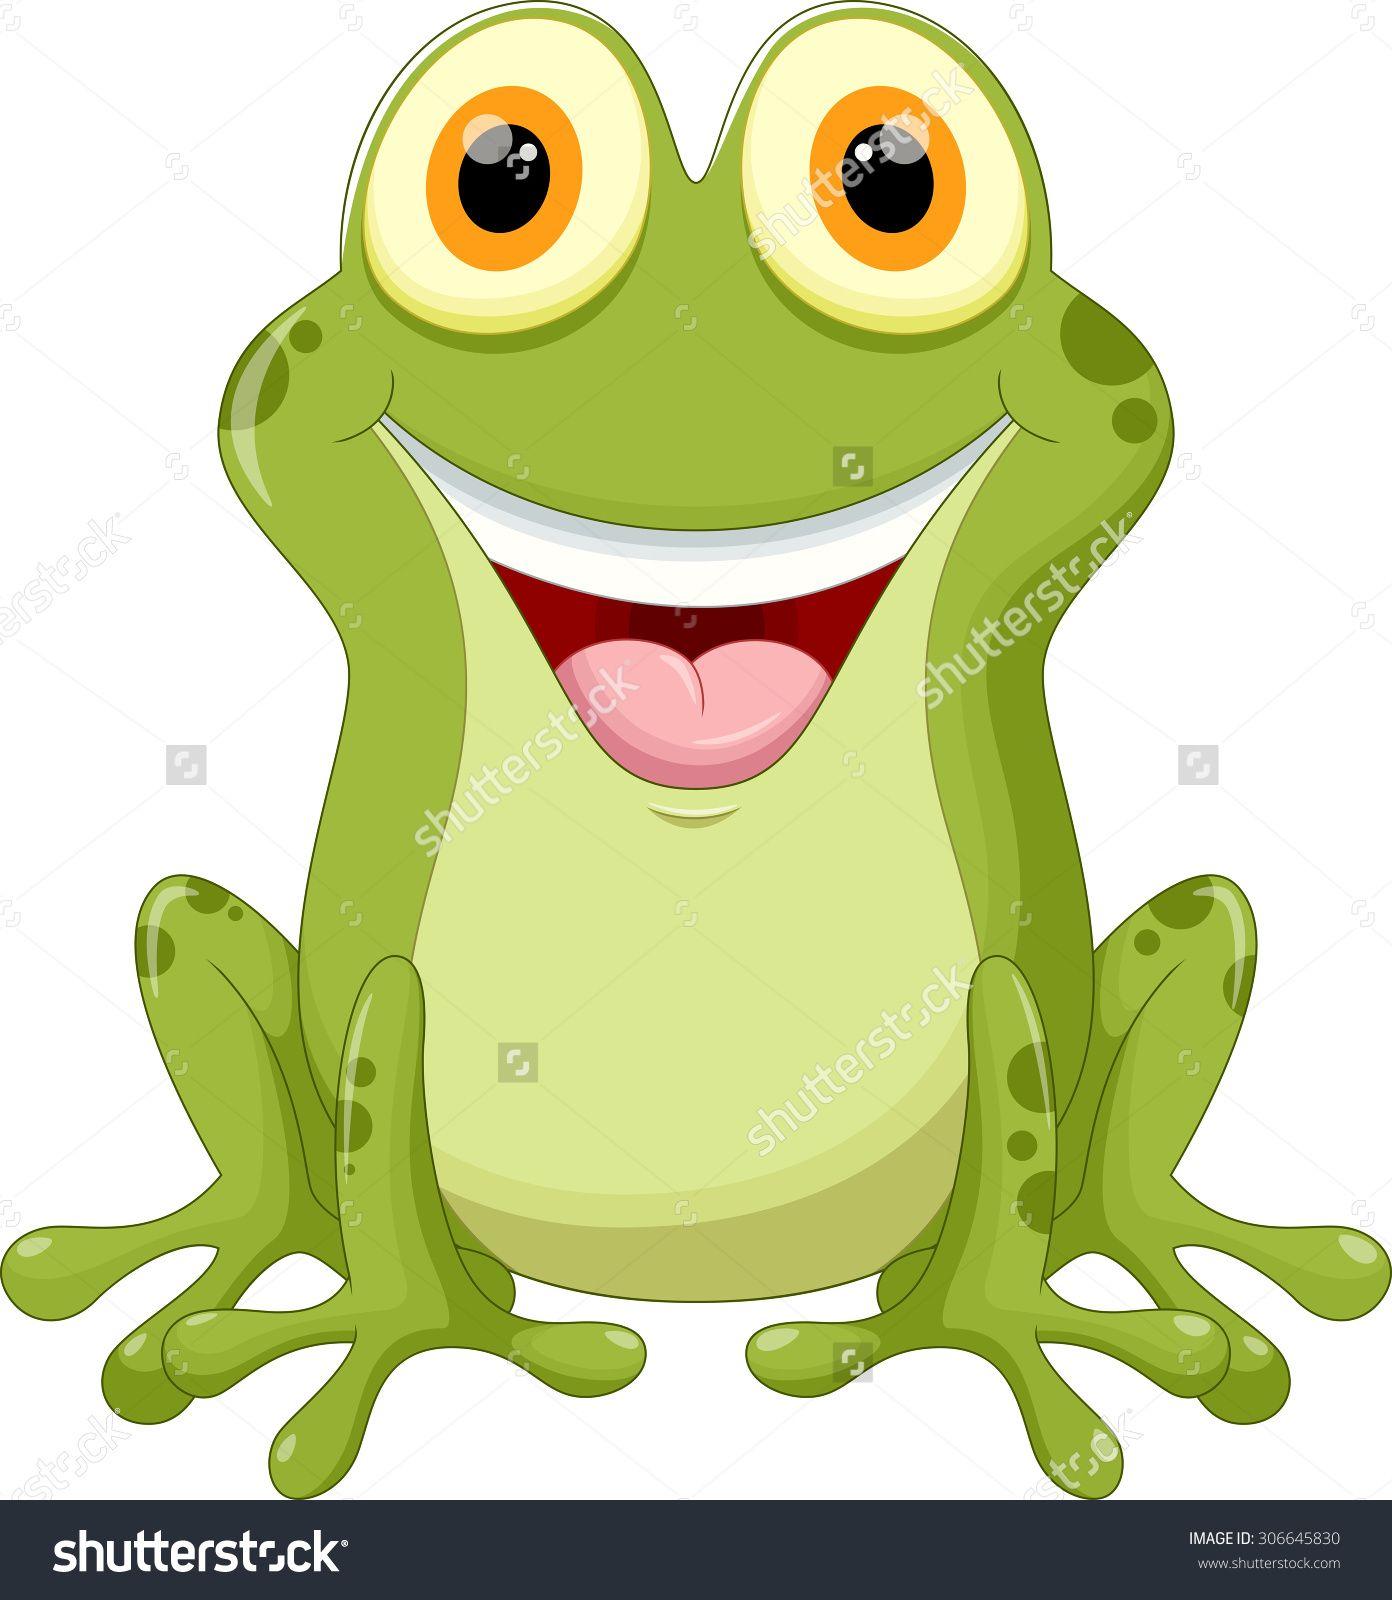 Cute Frog Cartoon Stokovaya Vektornaya Illyustraciya 306645830 Shutterstock Cute Frogs Funny Frog Pictures Cartoon Animals